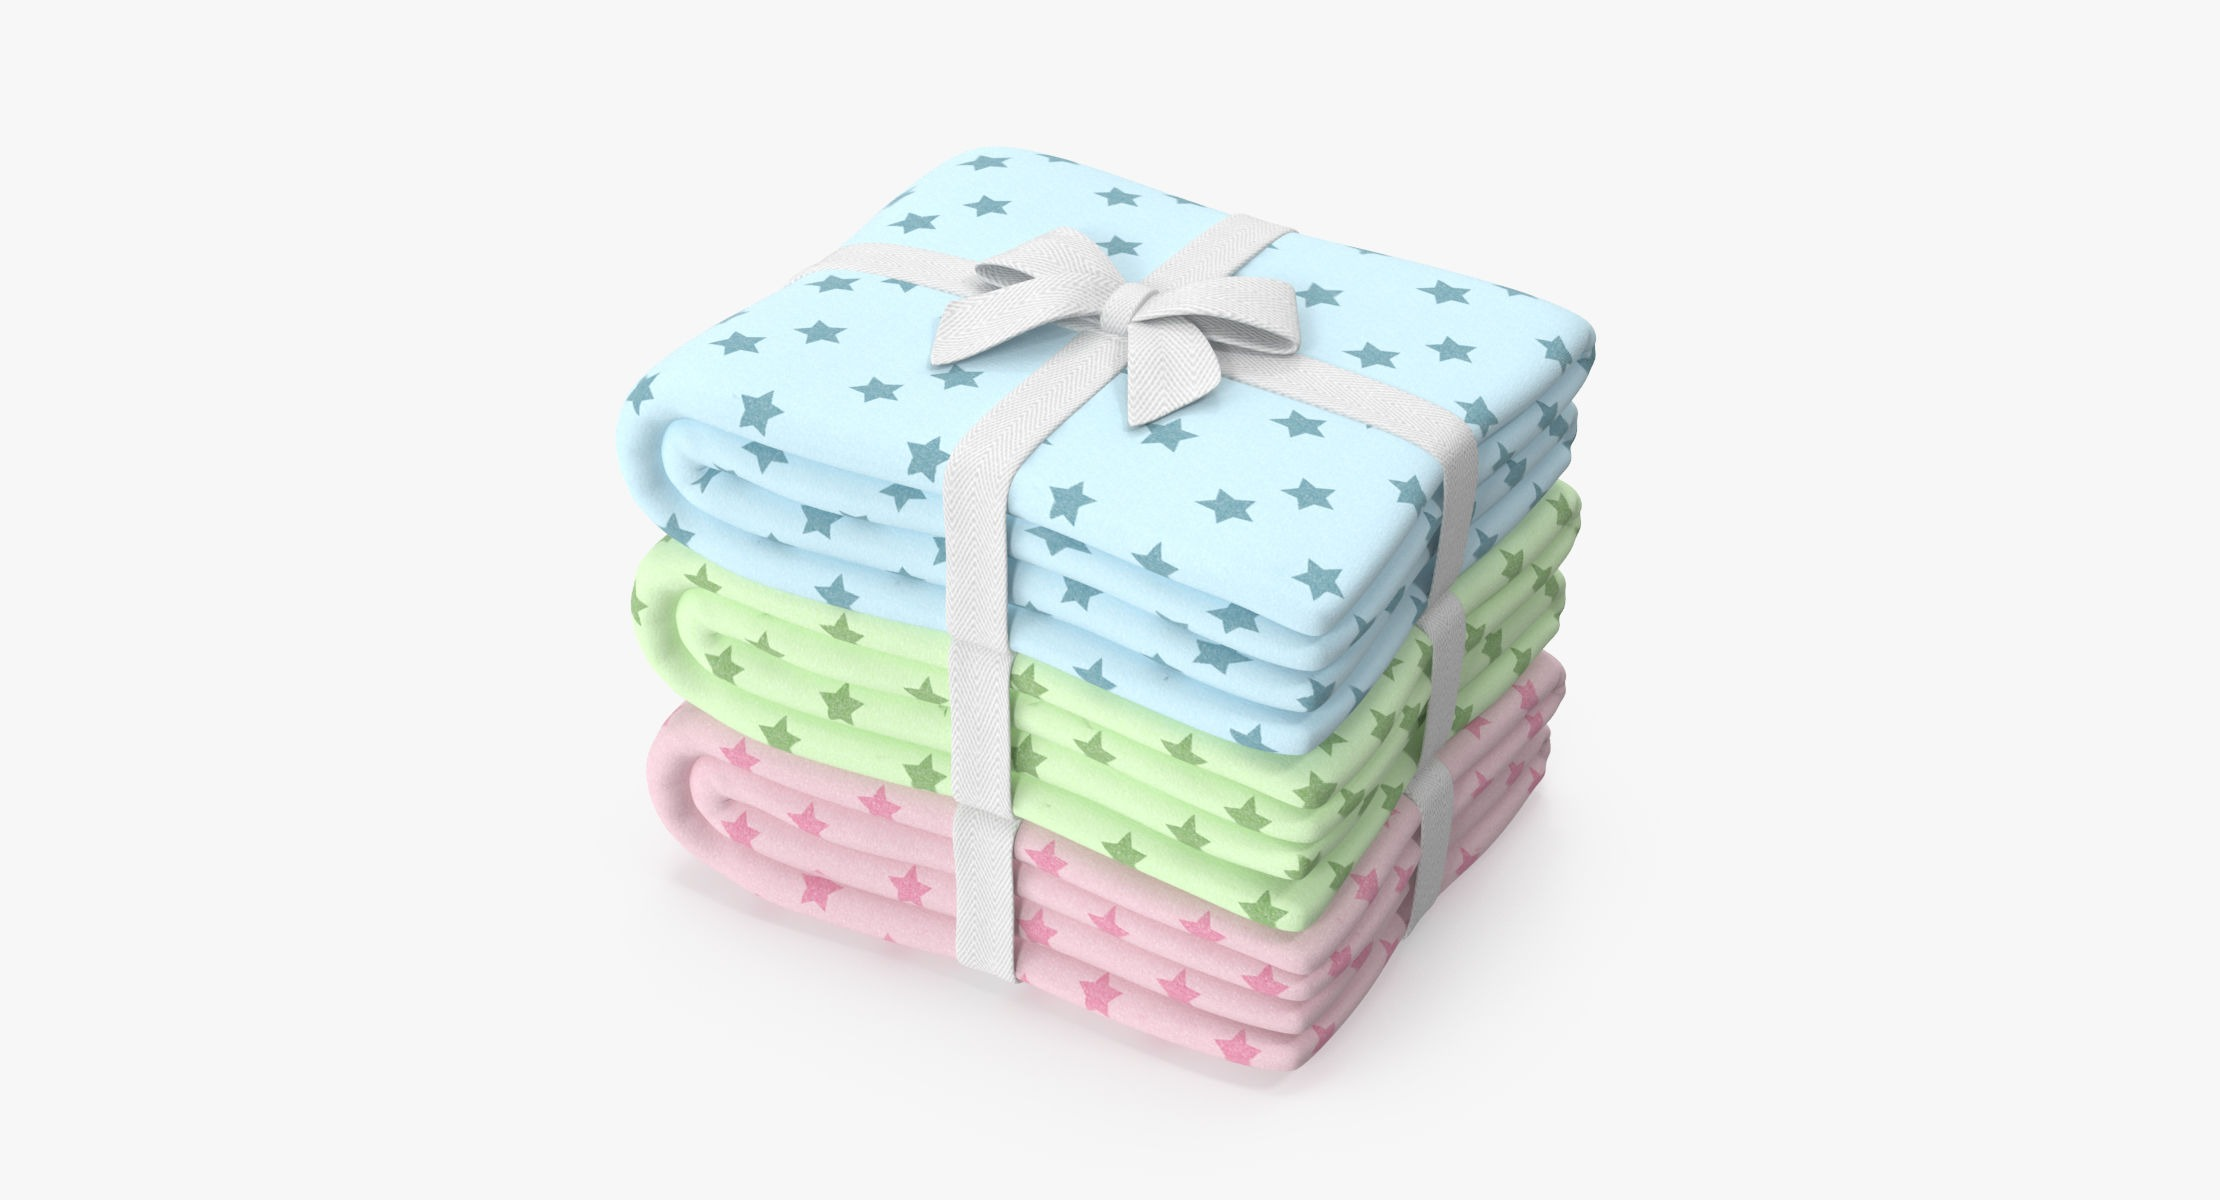 Baby Blankets 02 01 - reel 1